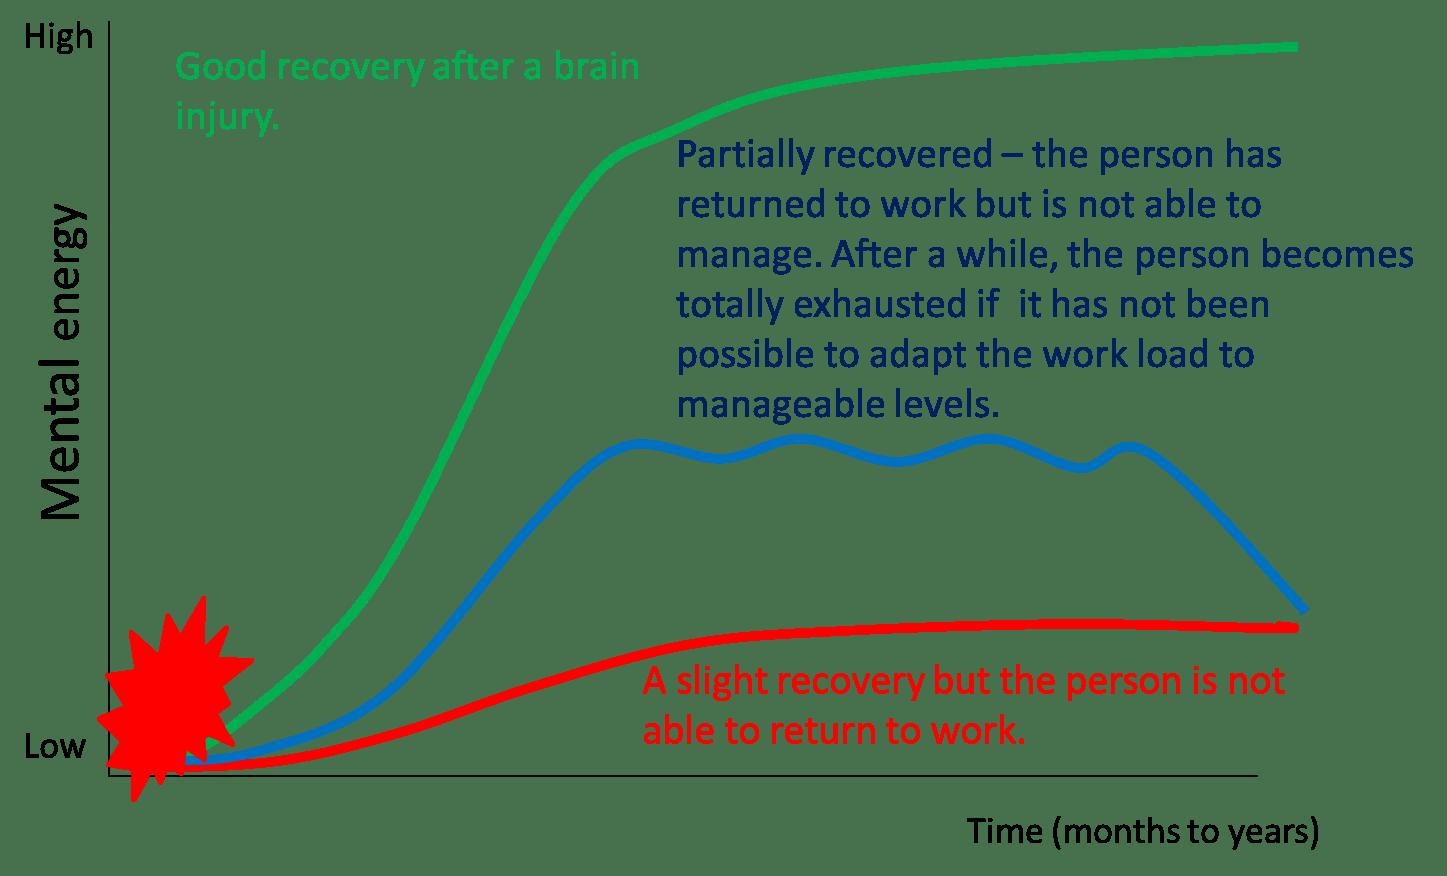 Long Lasting Mental Fatigue After Traumatic Brain Injury